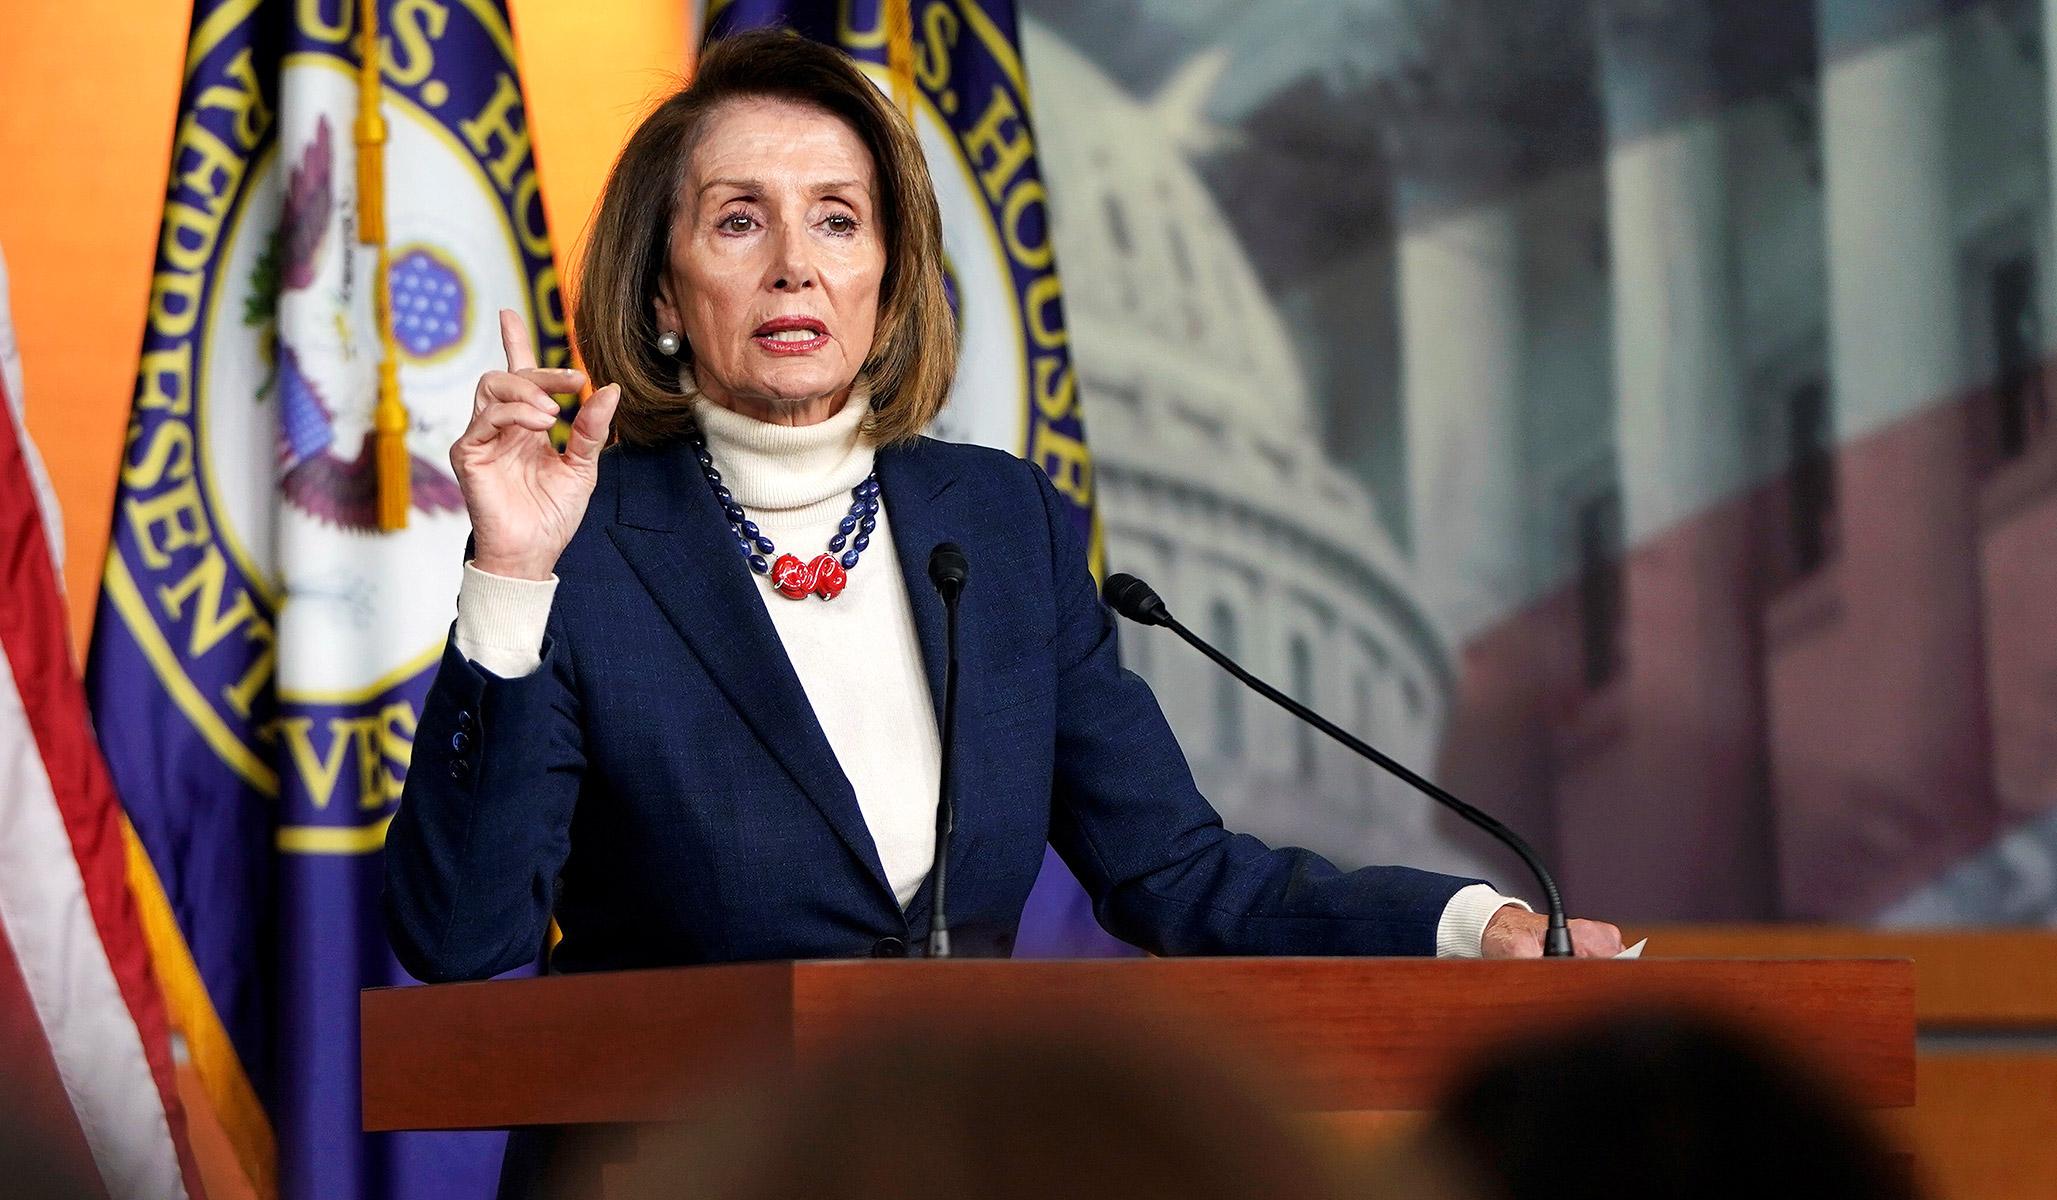 nationalreview.com - John Fund - Democrats Reject Trump Border Compromise, See Trump as Devil